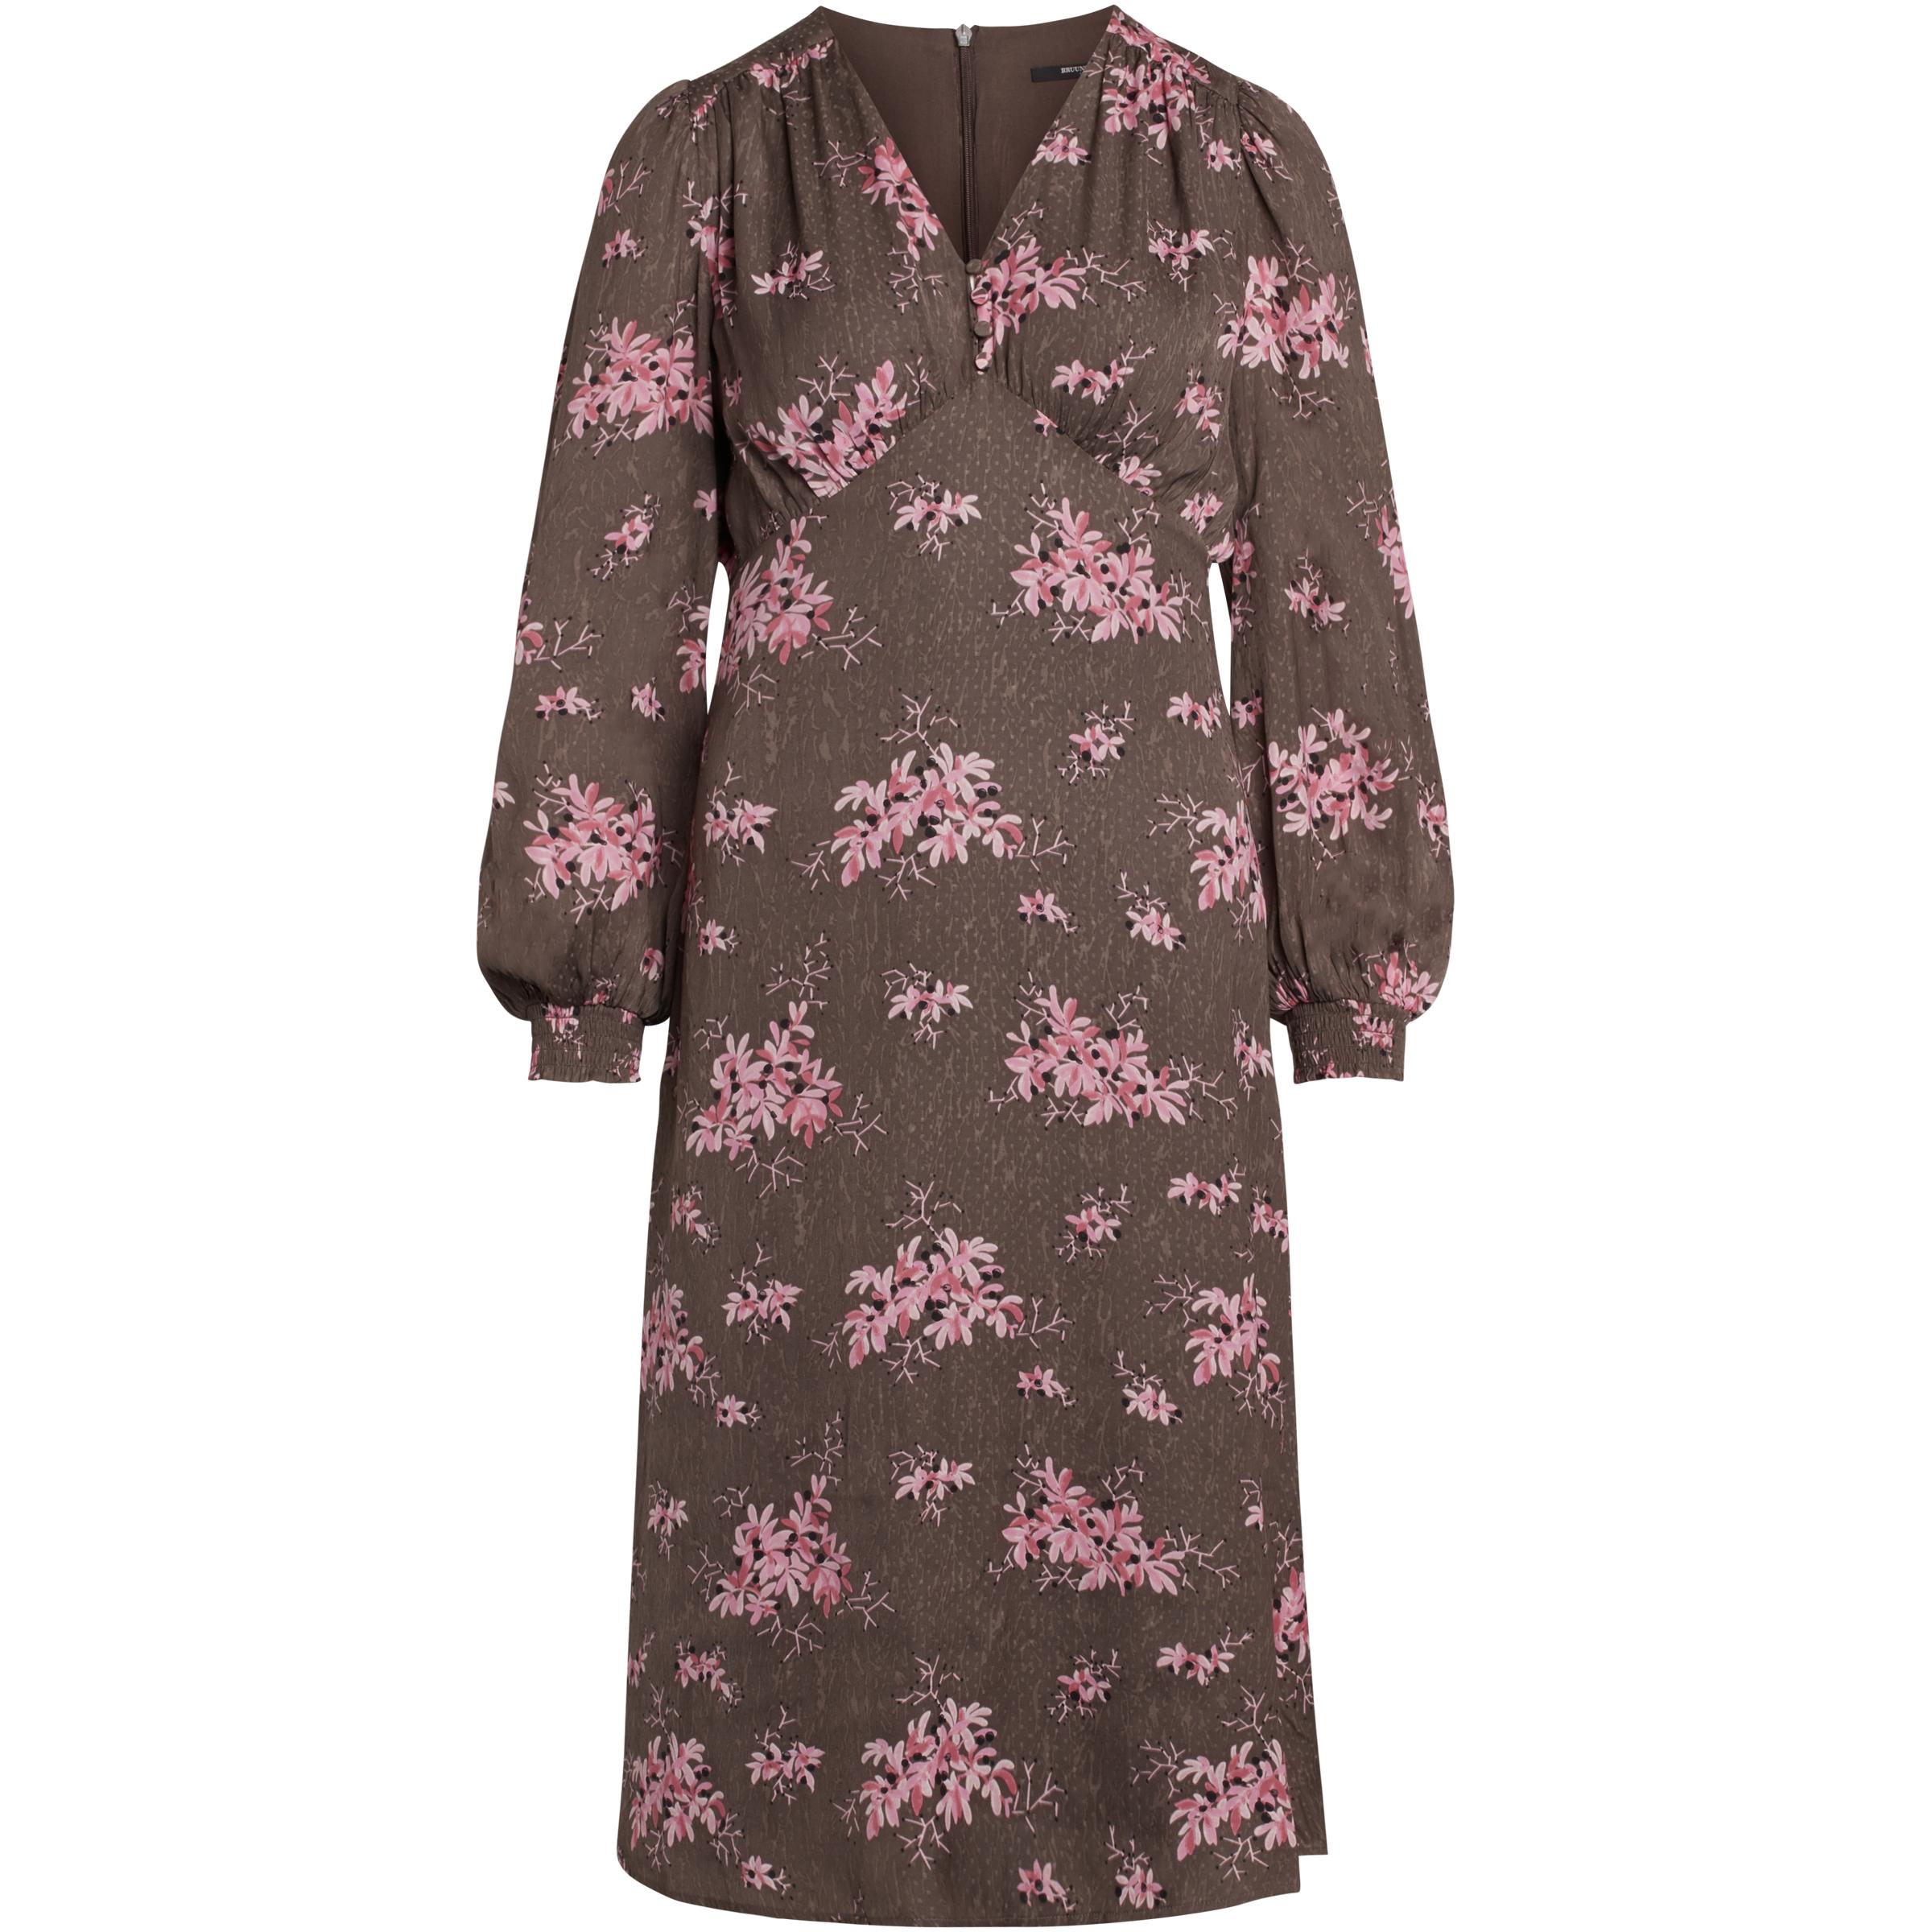 Prickly Dress